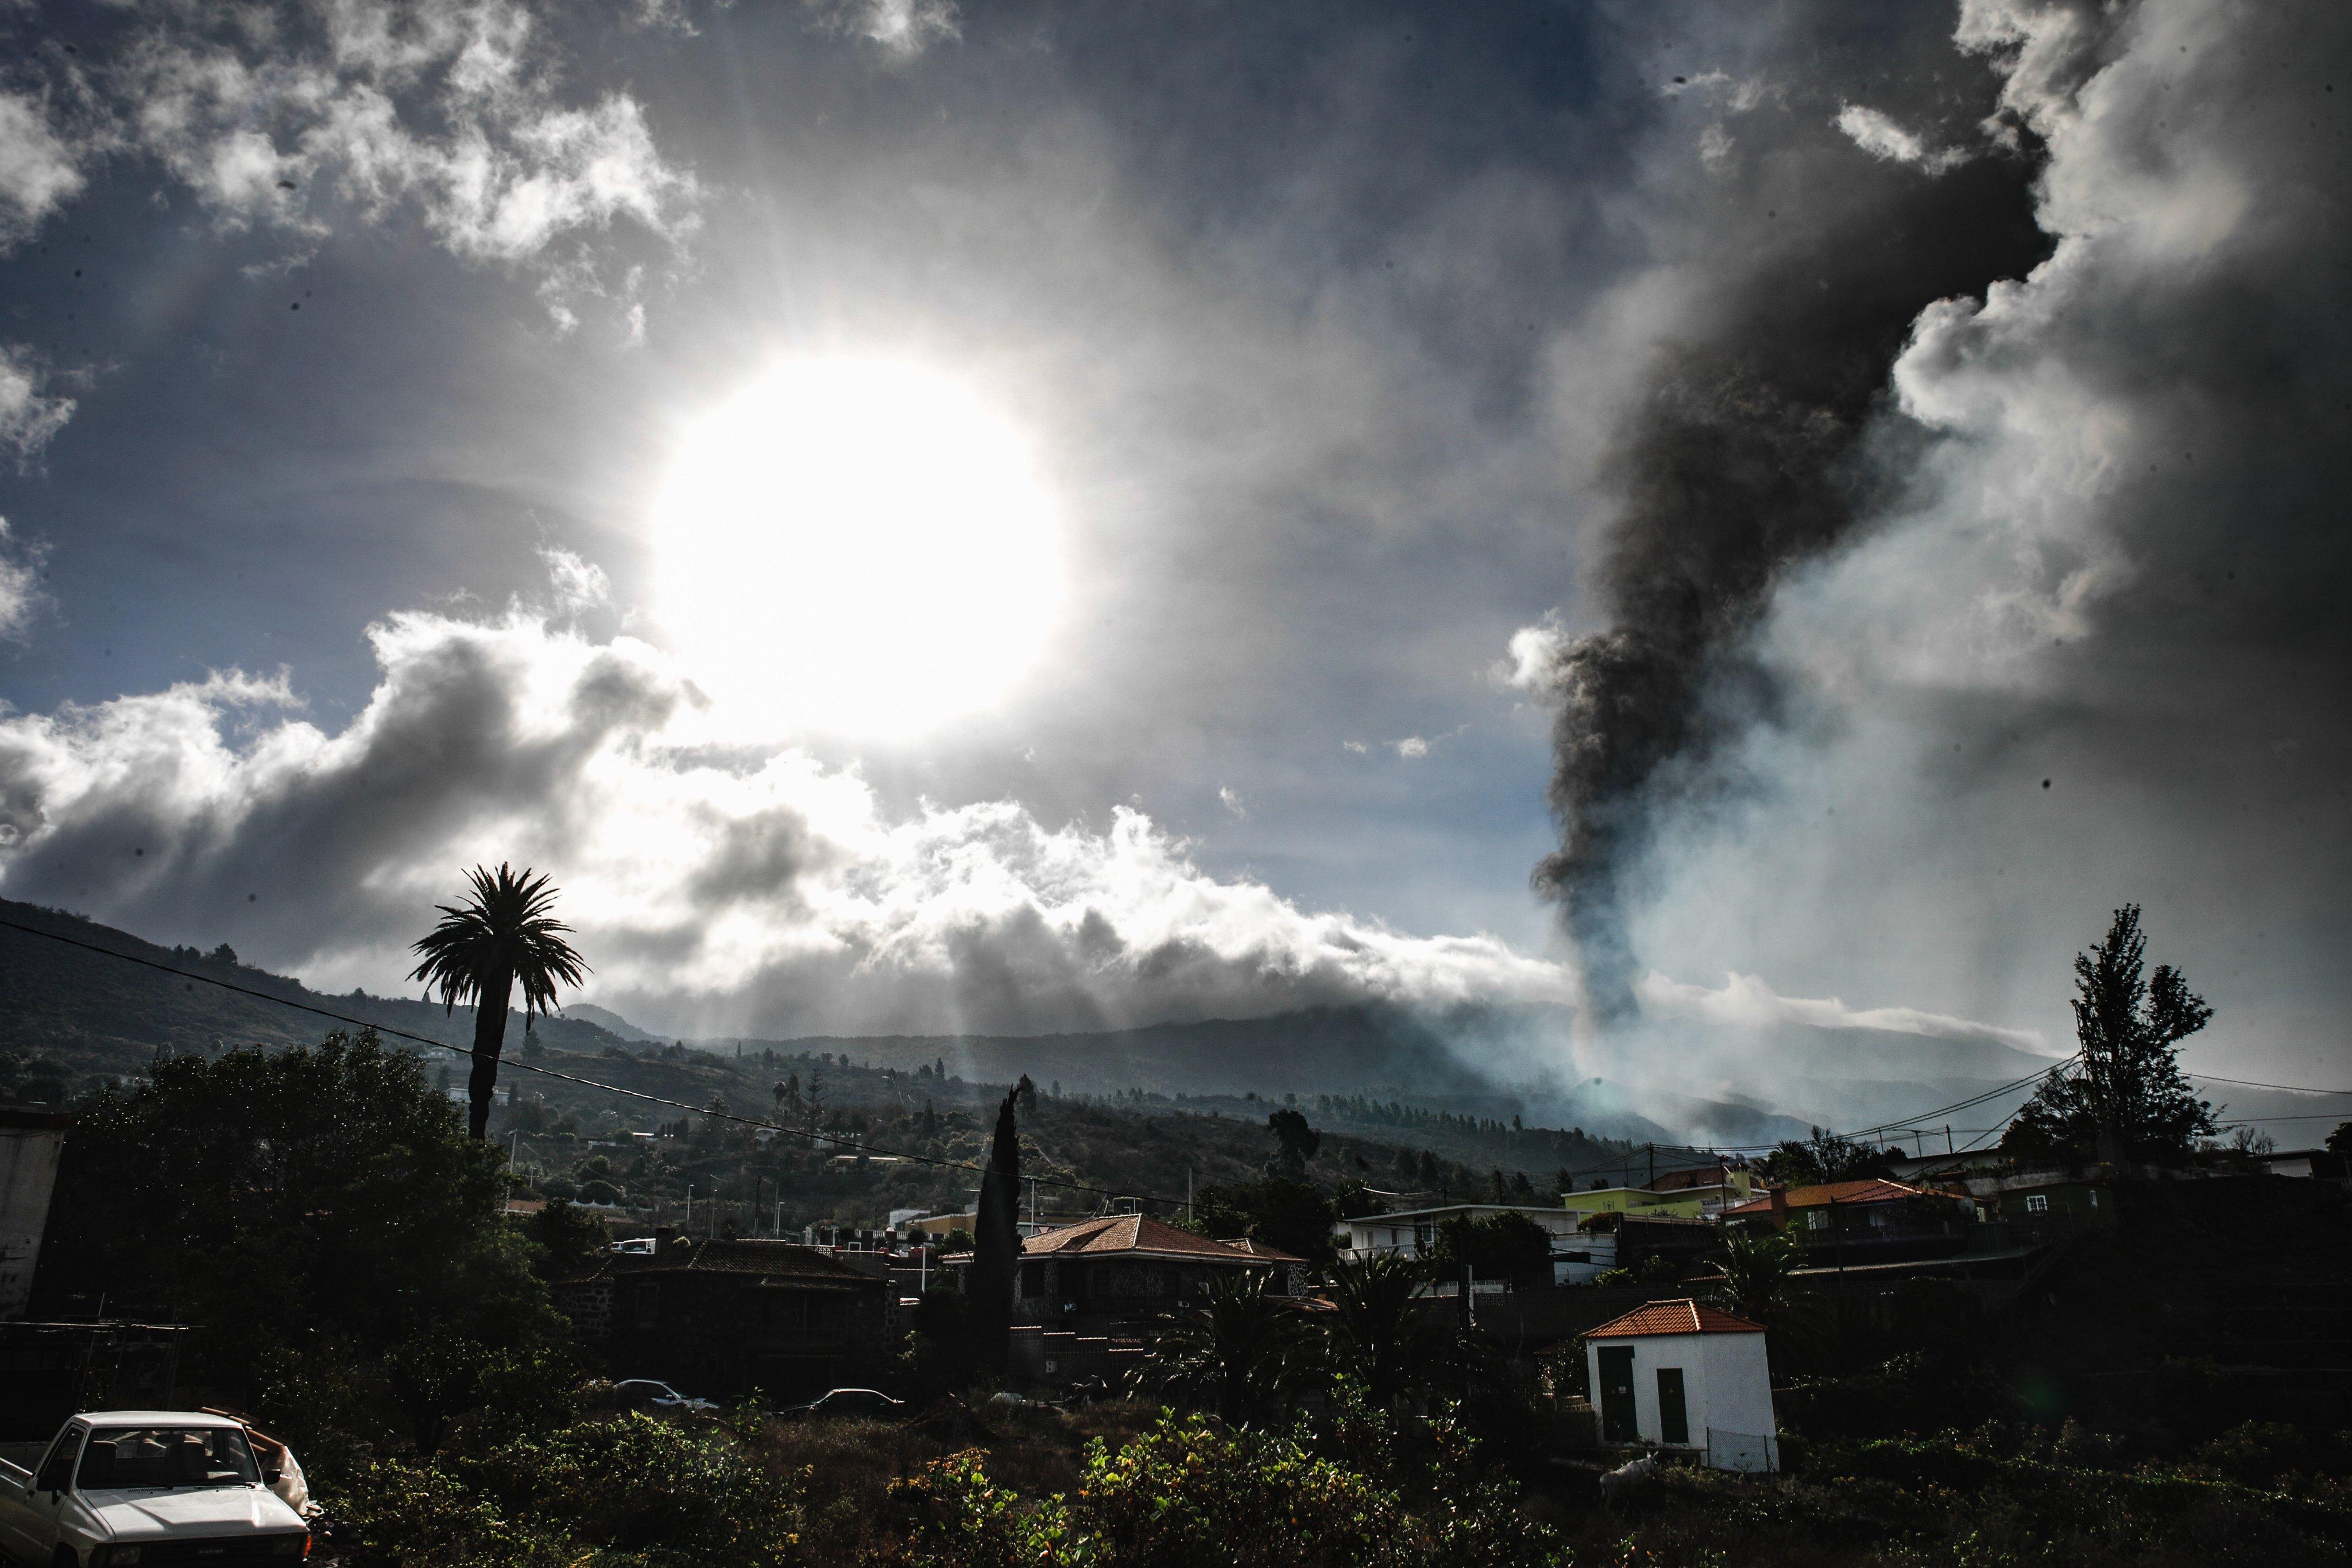 Evacuate The Town Of Todoque, In Los Llanos De Aridane (la Palma), By The Lava From The Volcano